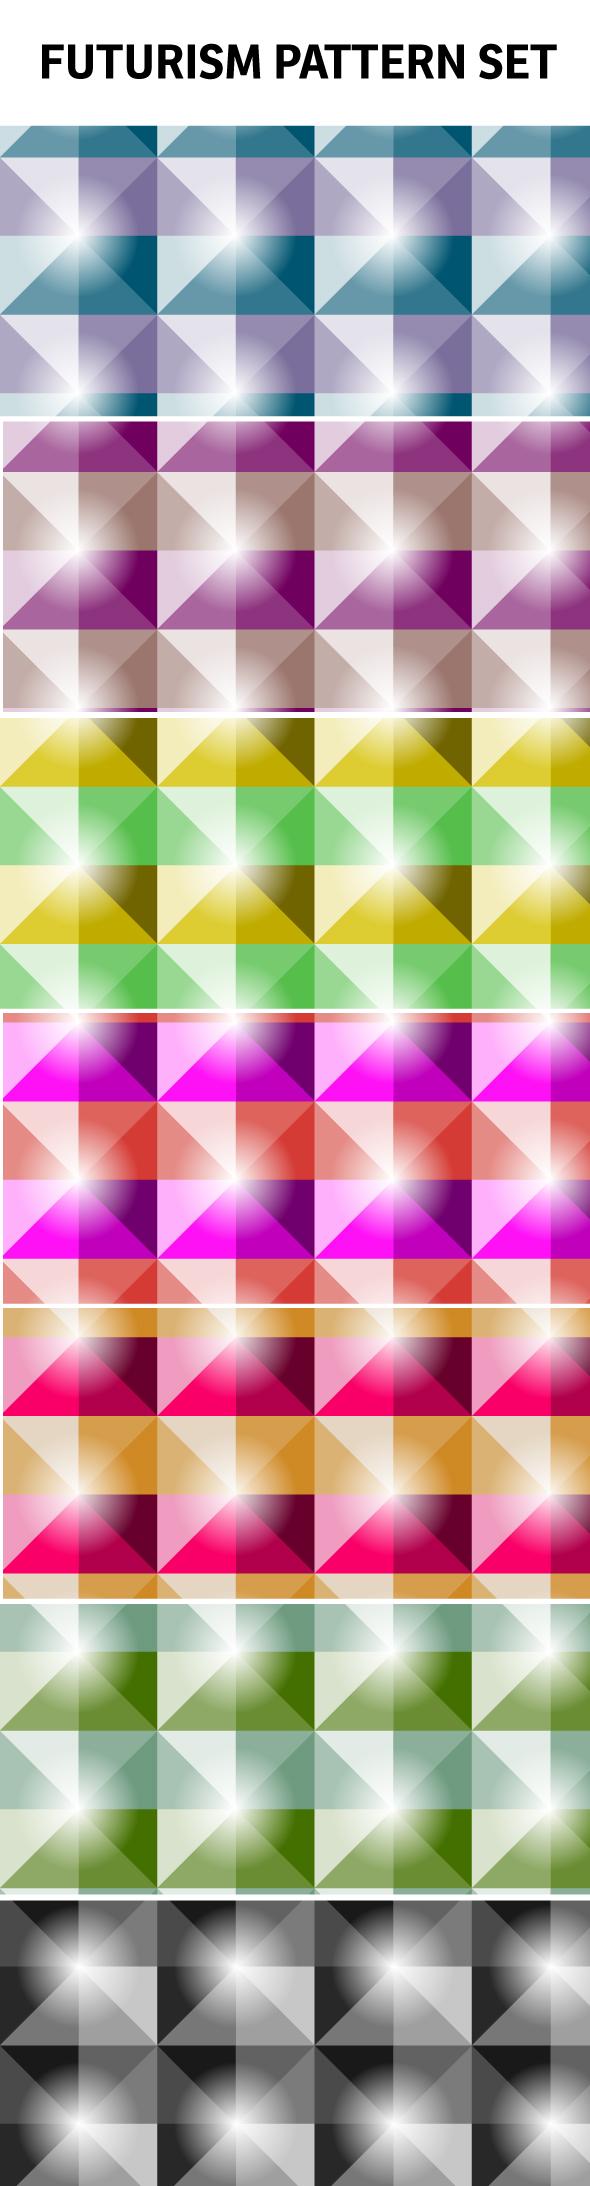 futursim big Futurism style seamless vector pattern